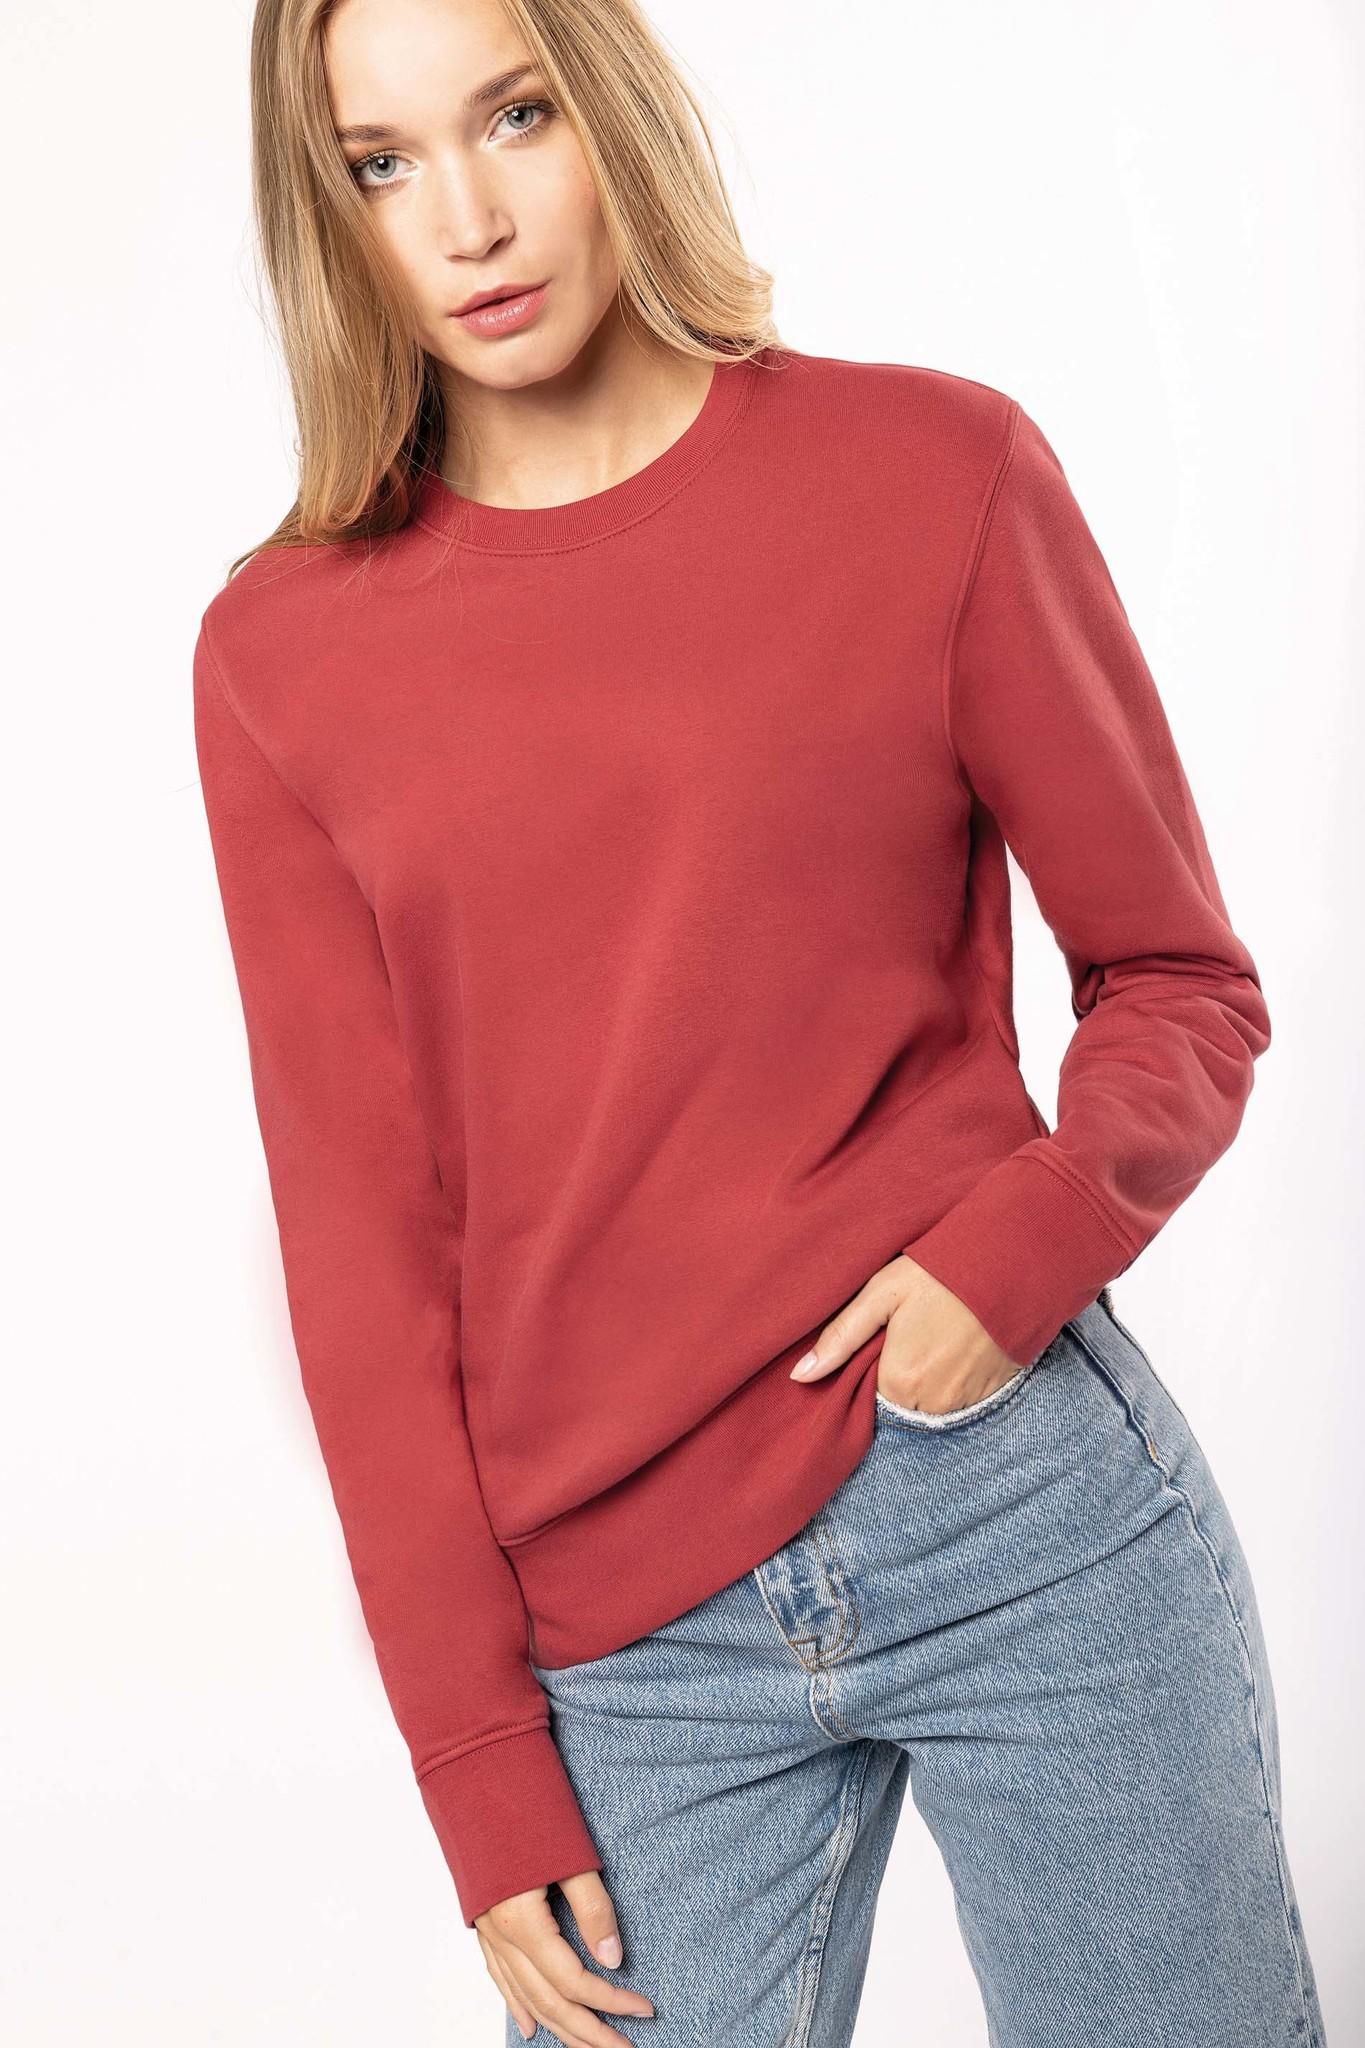 Eco-Friendly Sweater White